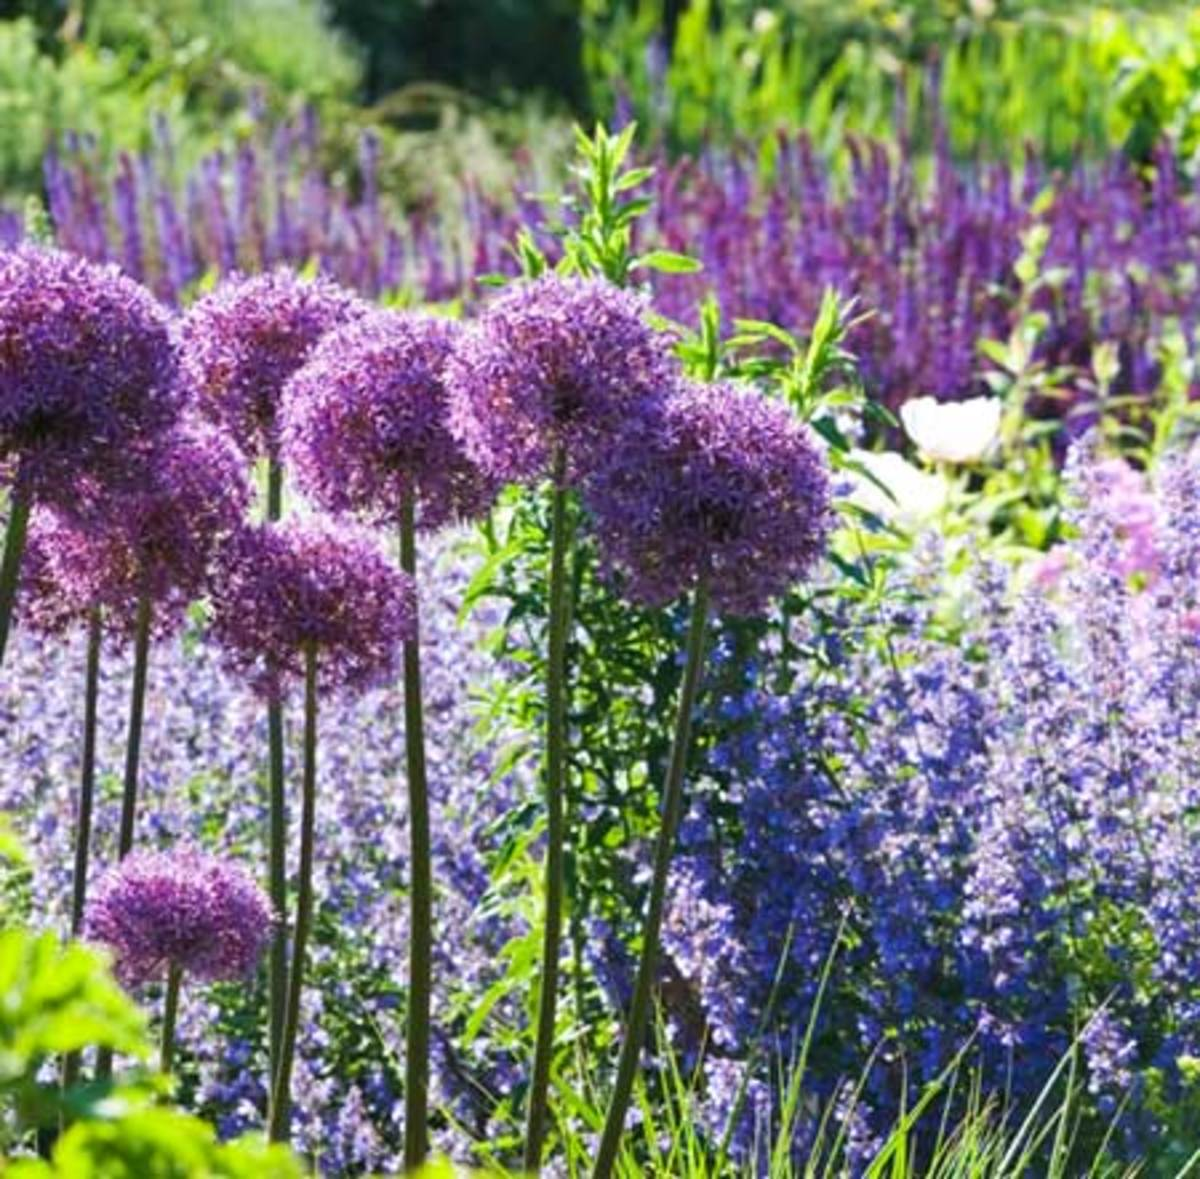 Deer Resistant Plants For The Four Season Garden Horticulture